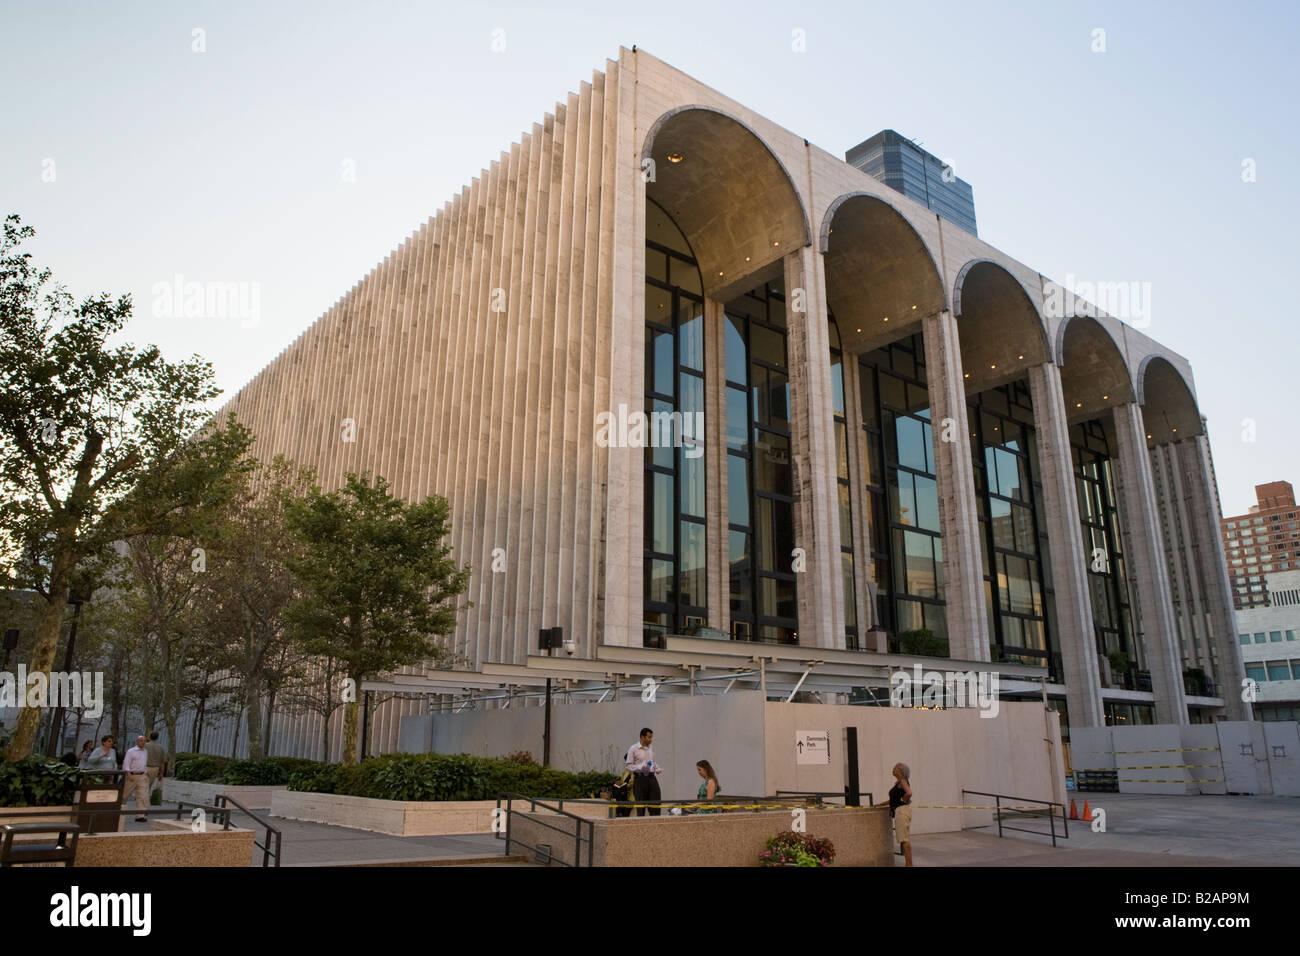 Metropolitan Opera House Lincoln Center New York City - Stock Image